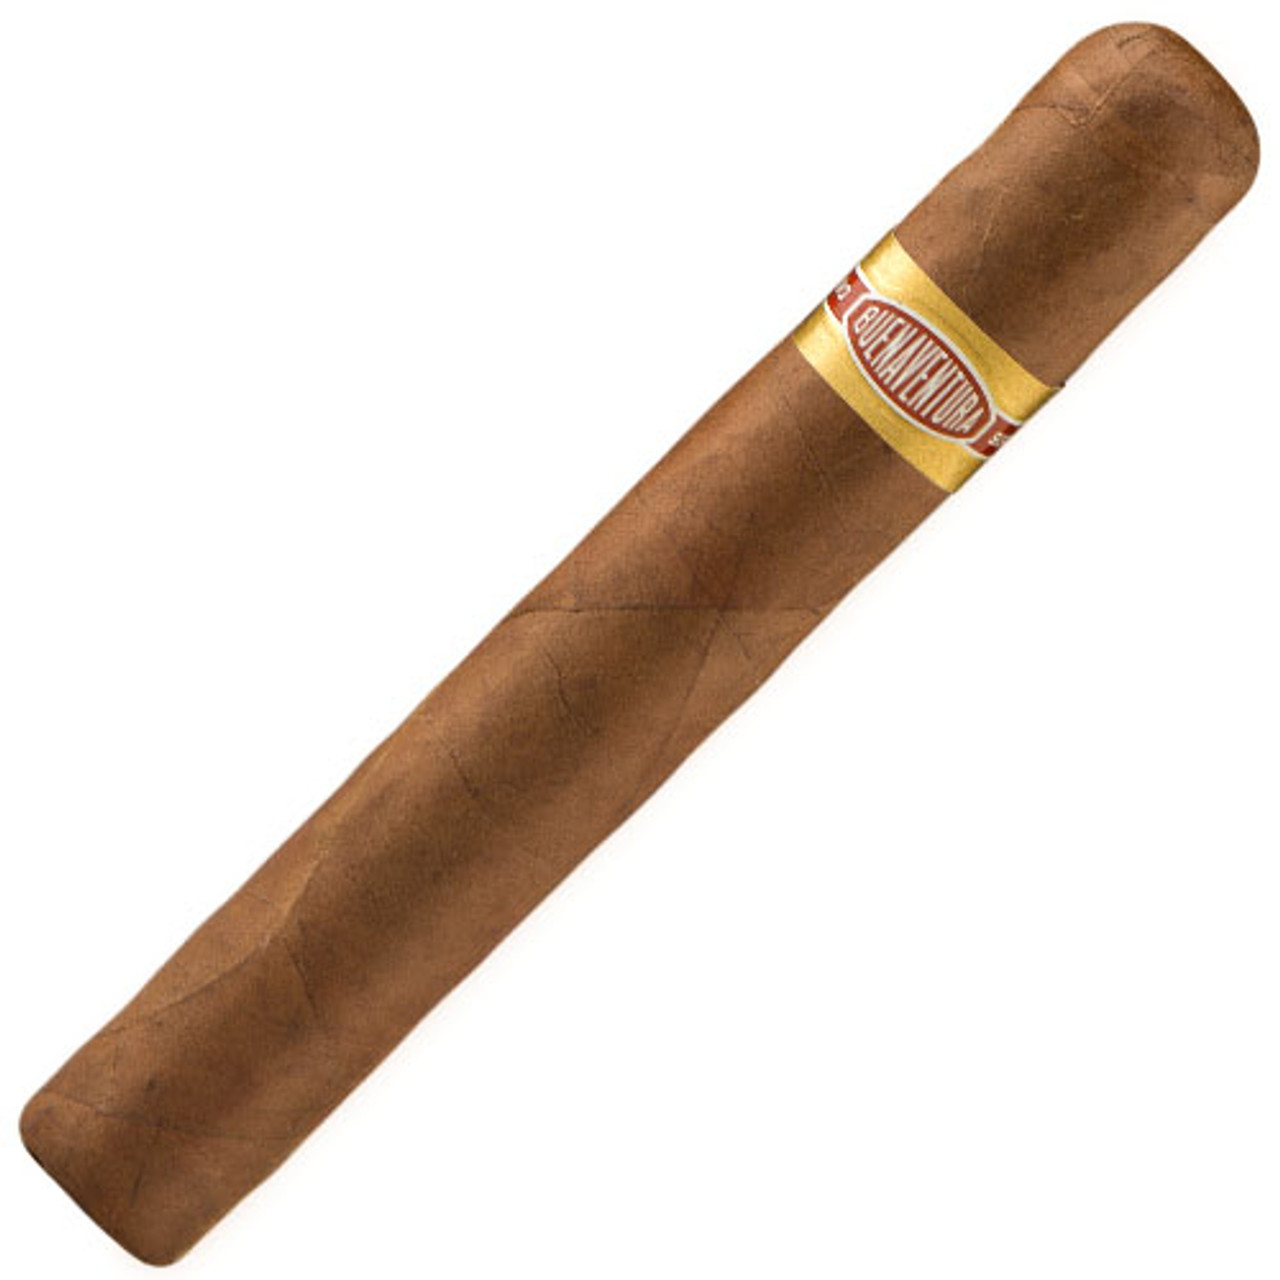 Curivari Buenaventura BV 500 Cigars - 5.25 x 50 (Box of 10)